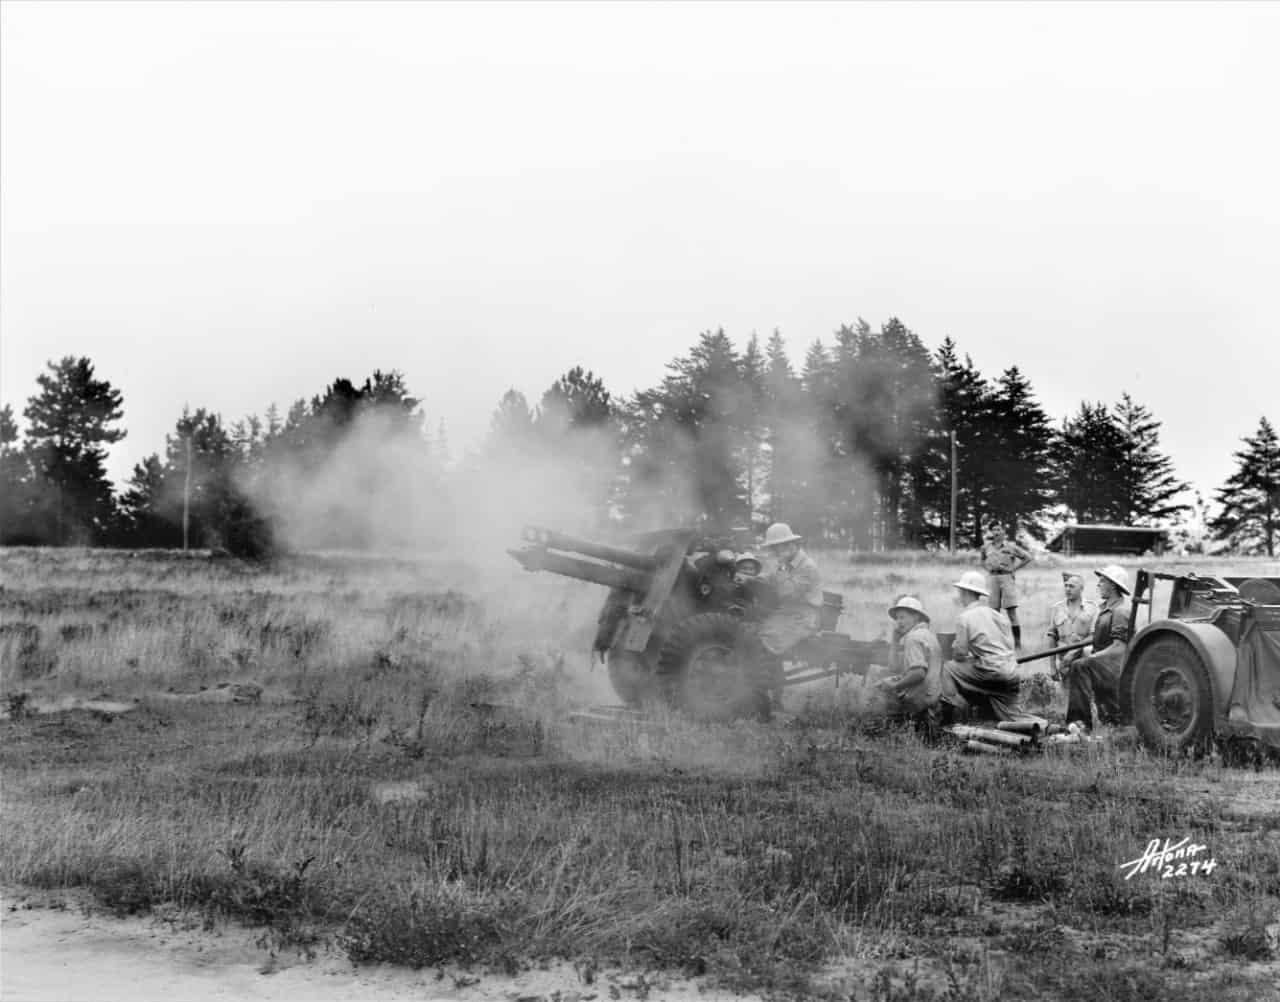 Petawawa-20-July-1945-firing-25-Pounder